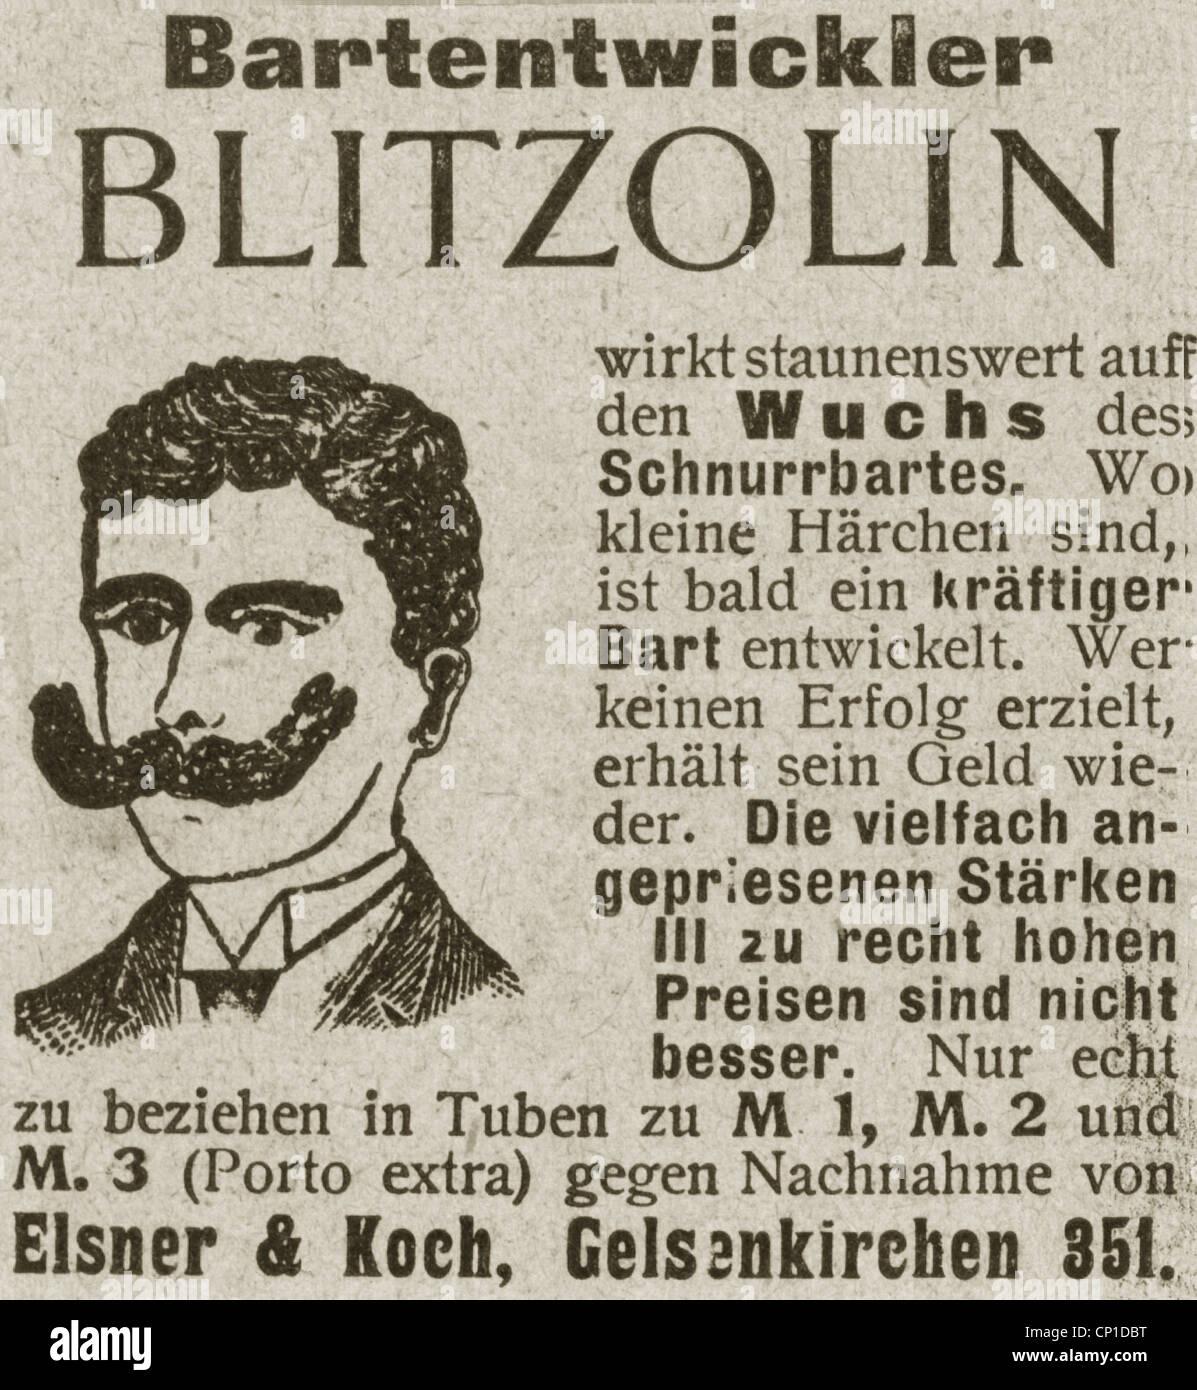 Kosmetik Gelsenkirchen werbung, kosmetik, werbung, bart haarwachstum tonic 'blitzolin', von